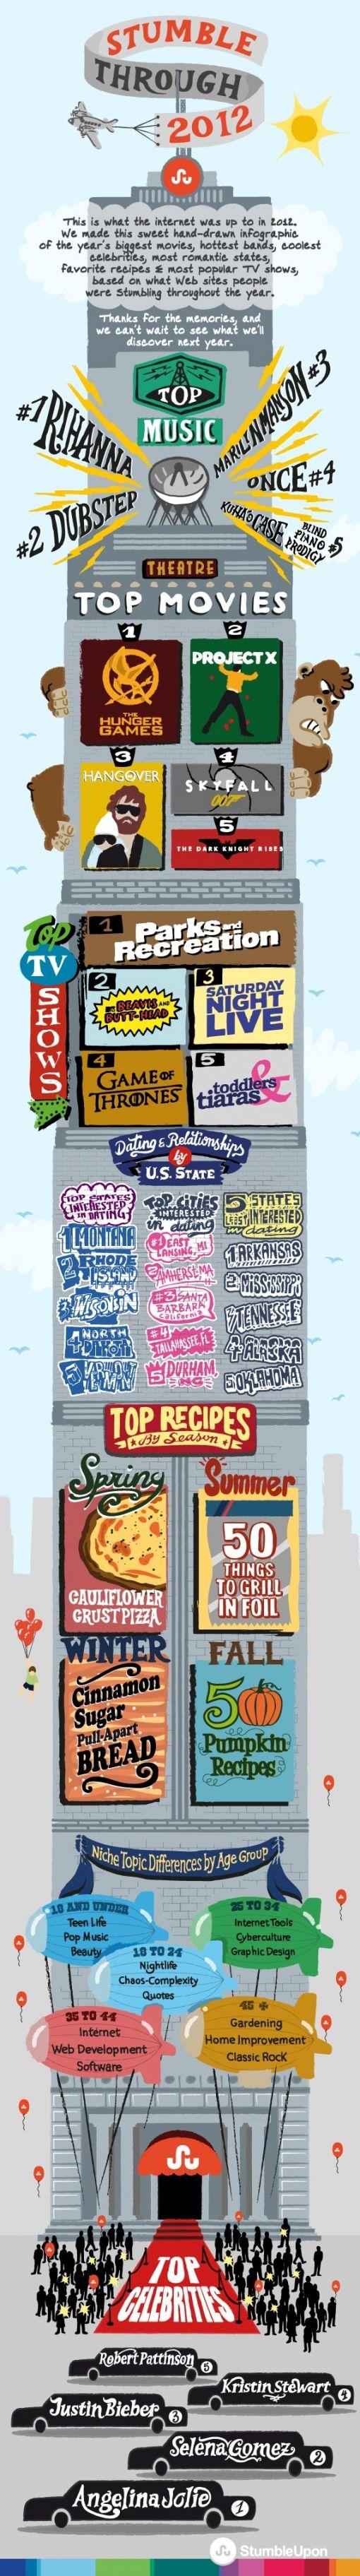 stumbleupon-2012-infographic